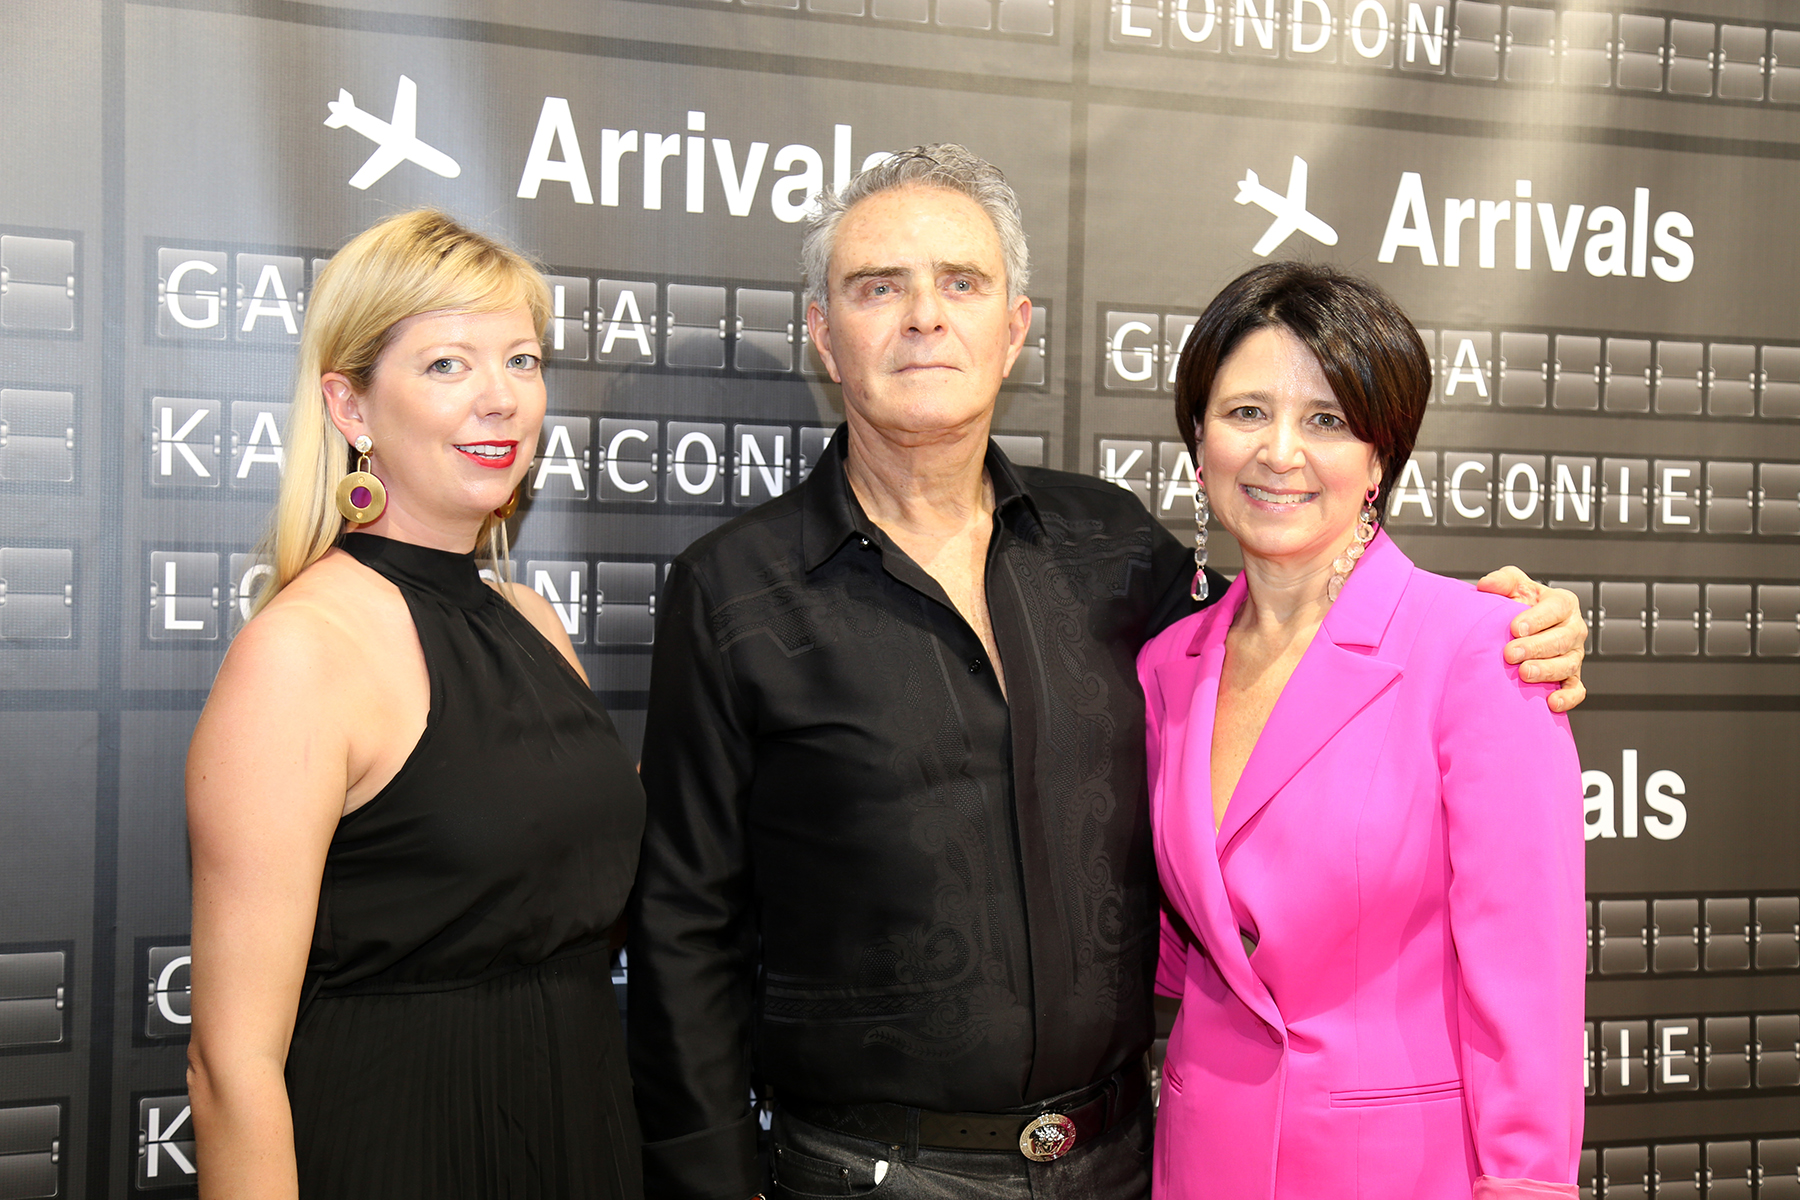 Kat Maconi, Carlyle y Sandra Castello. (Nichole Saldarriaga)